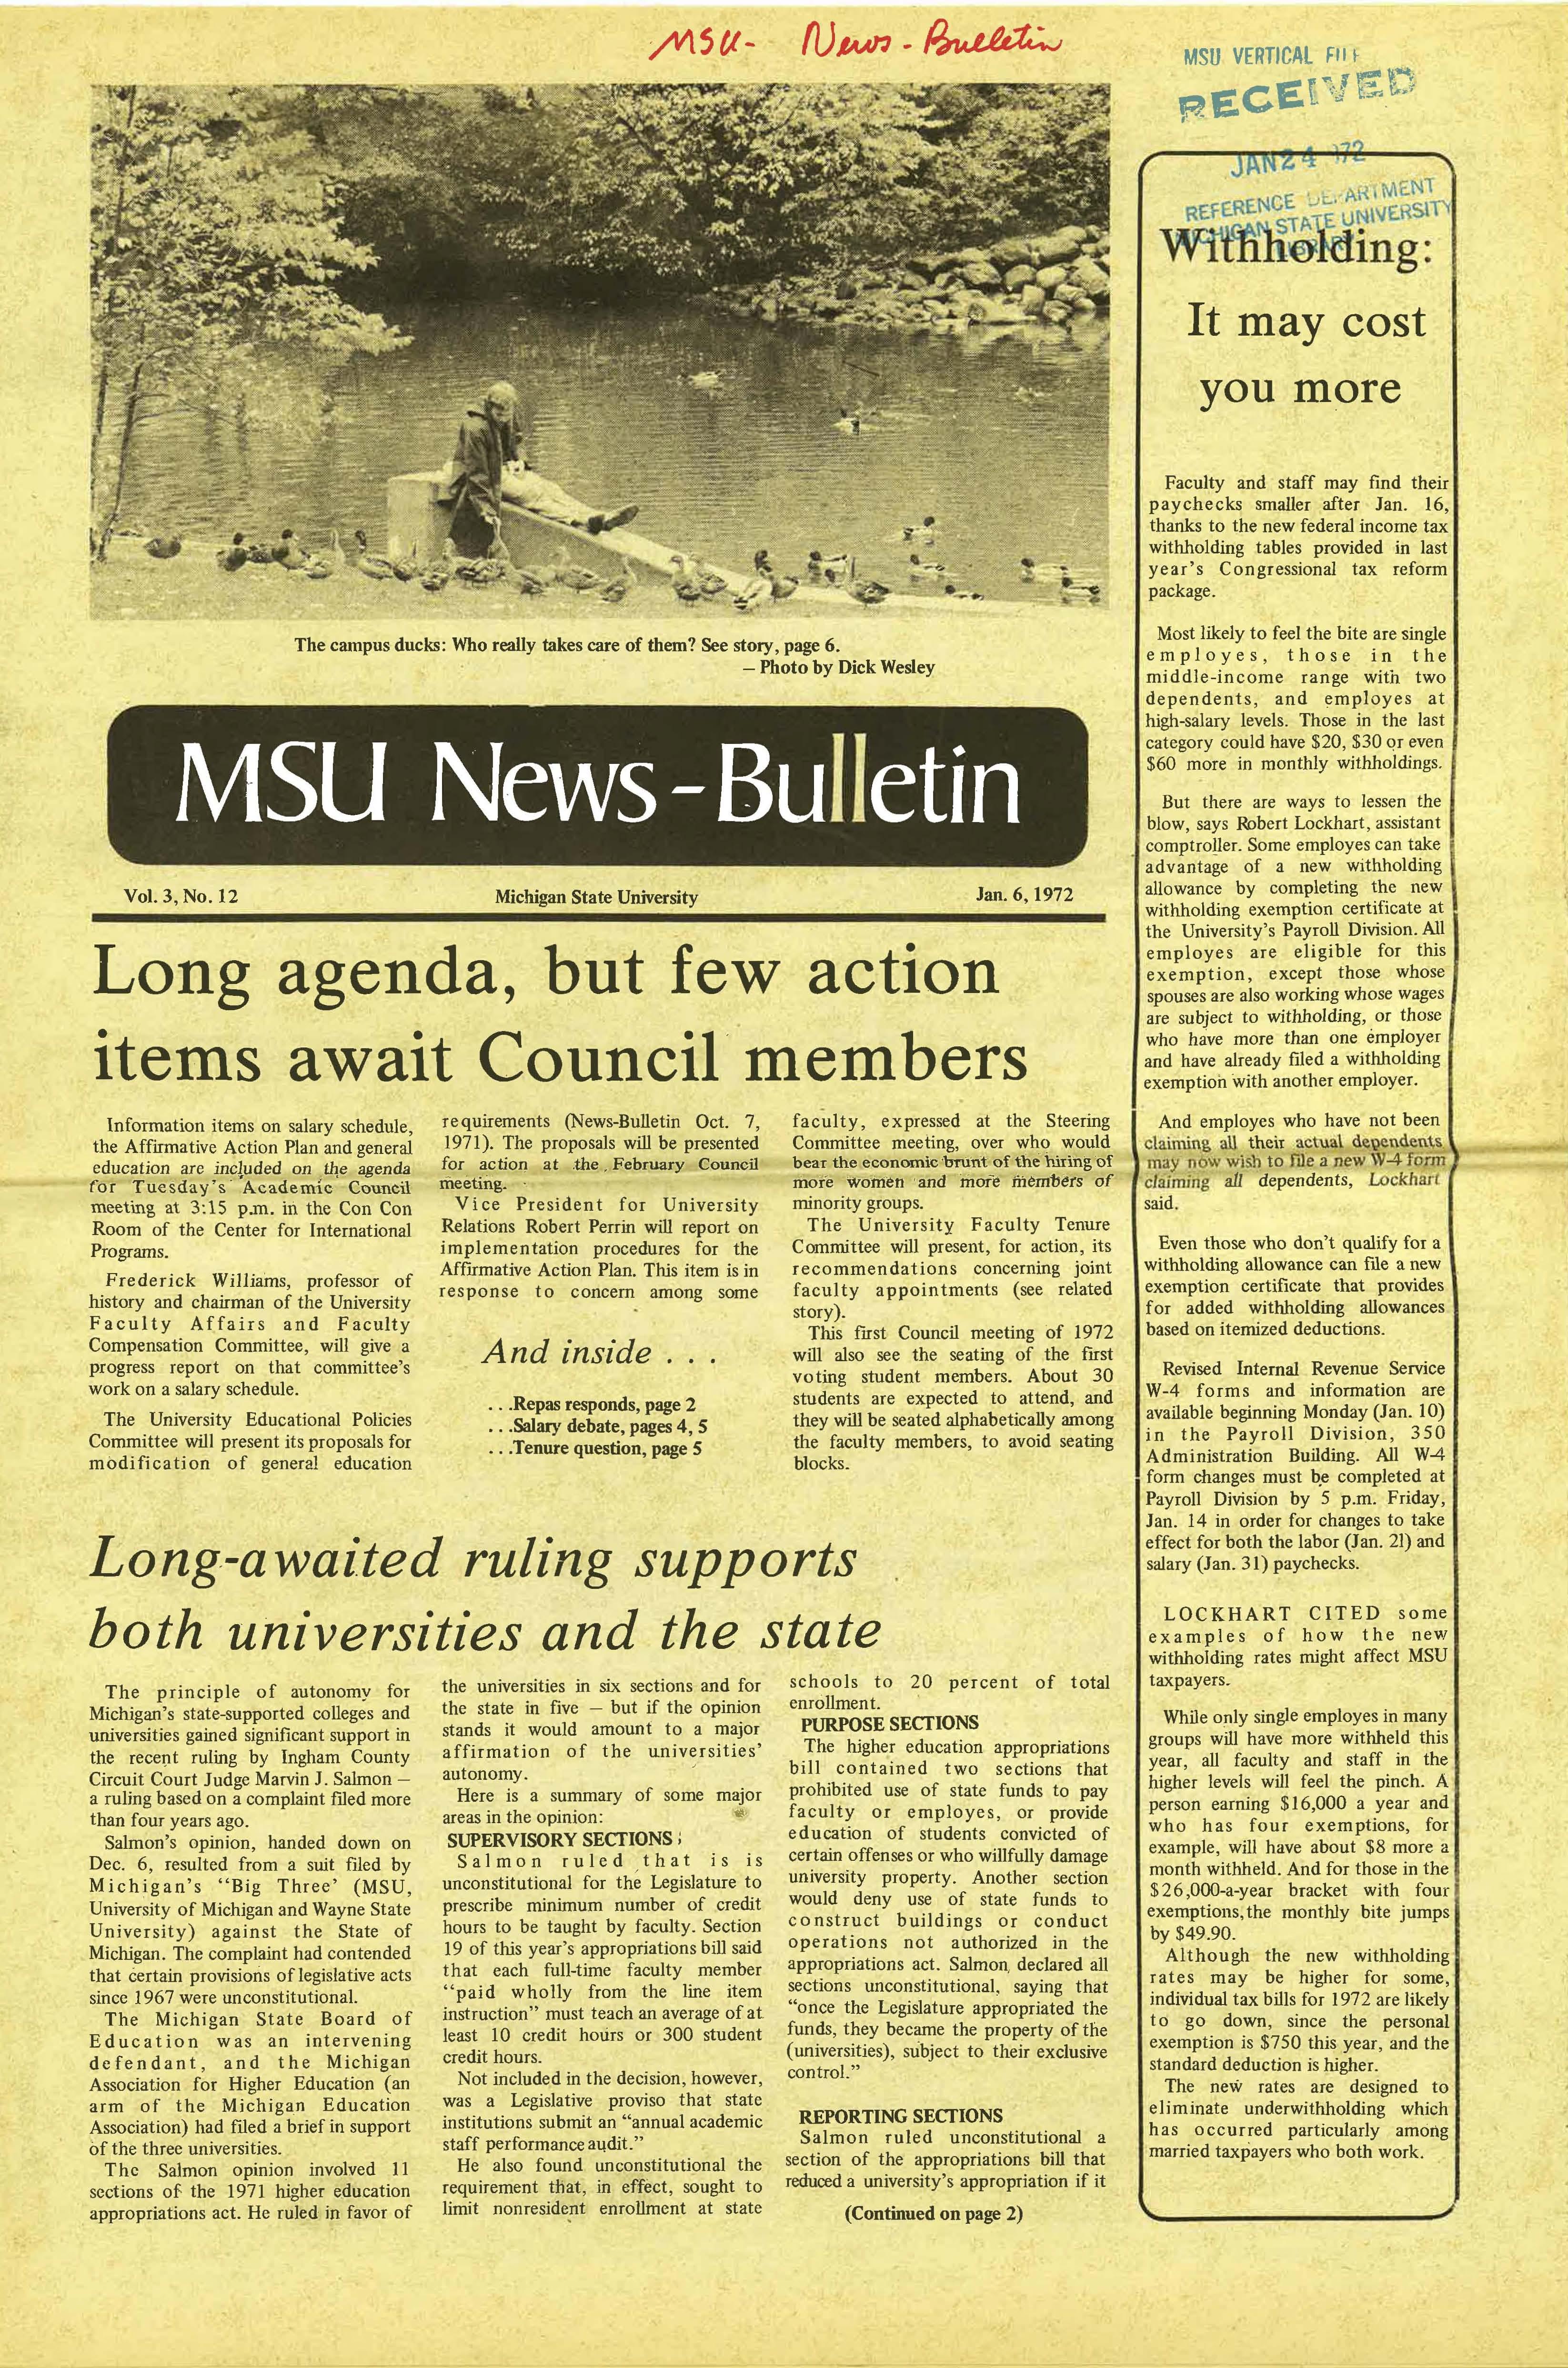 MSU News Bulletin, vol. 4, No. 06, October 26, 1972